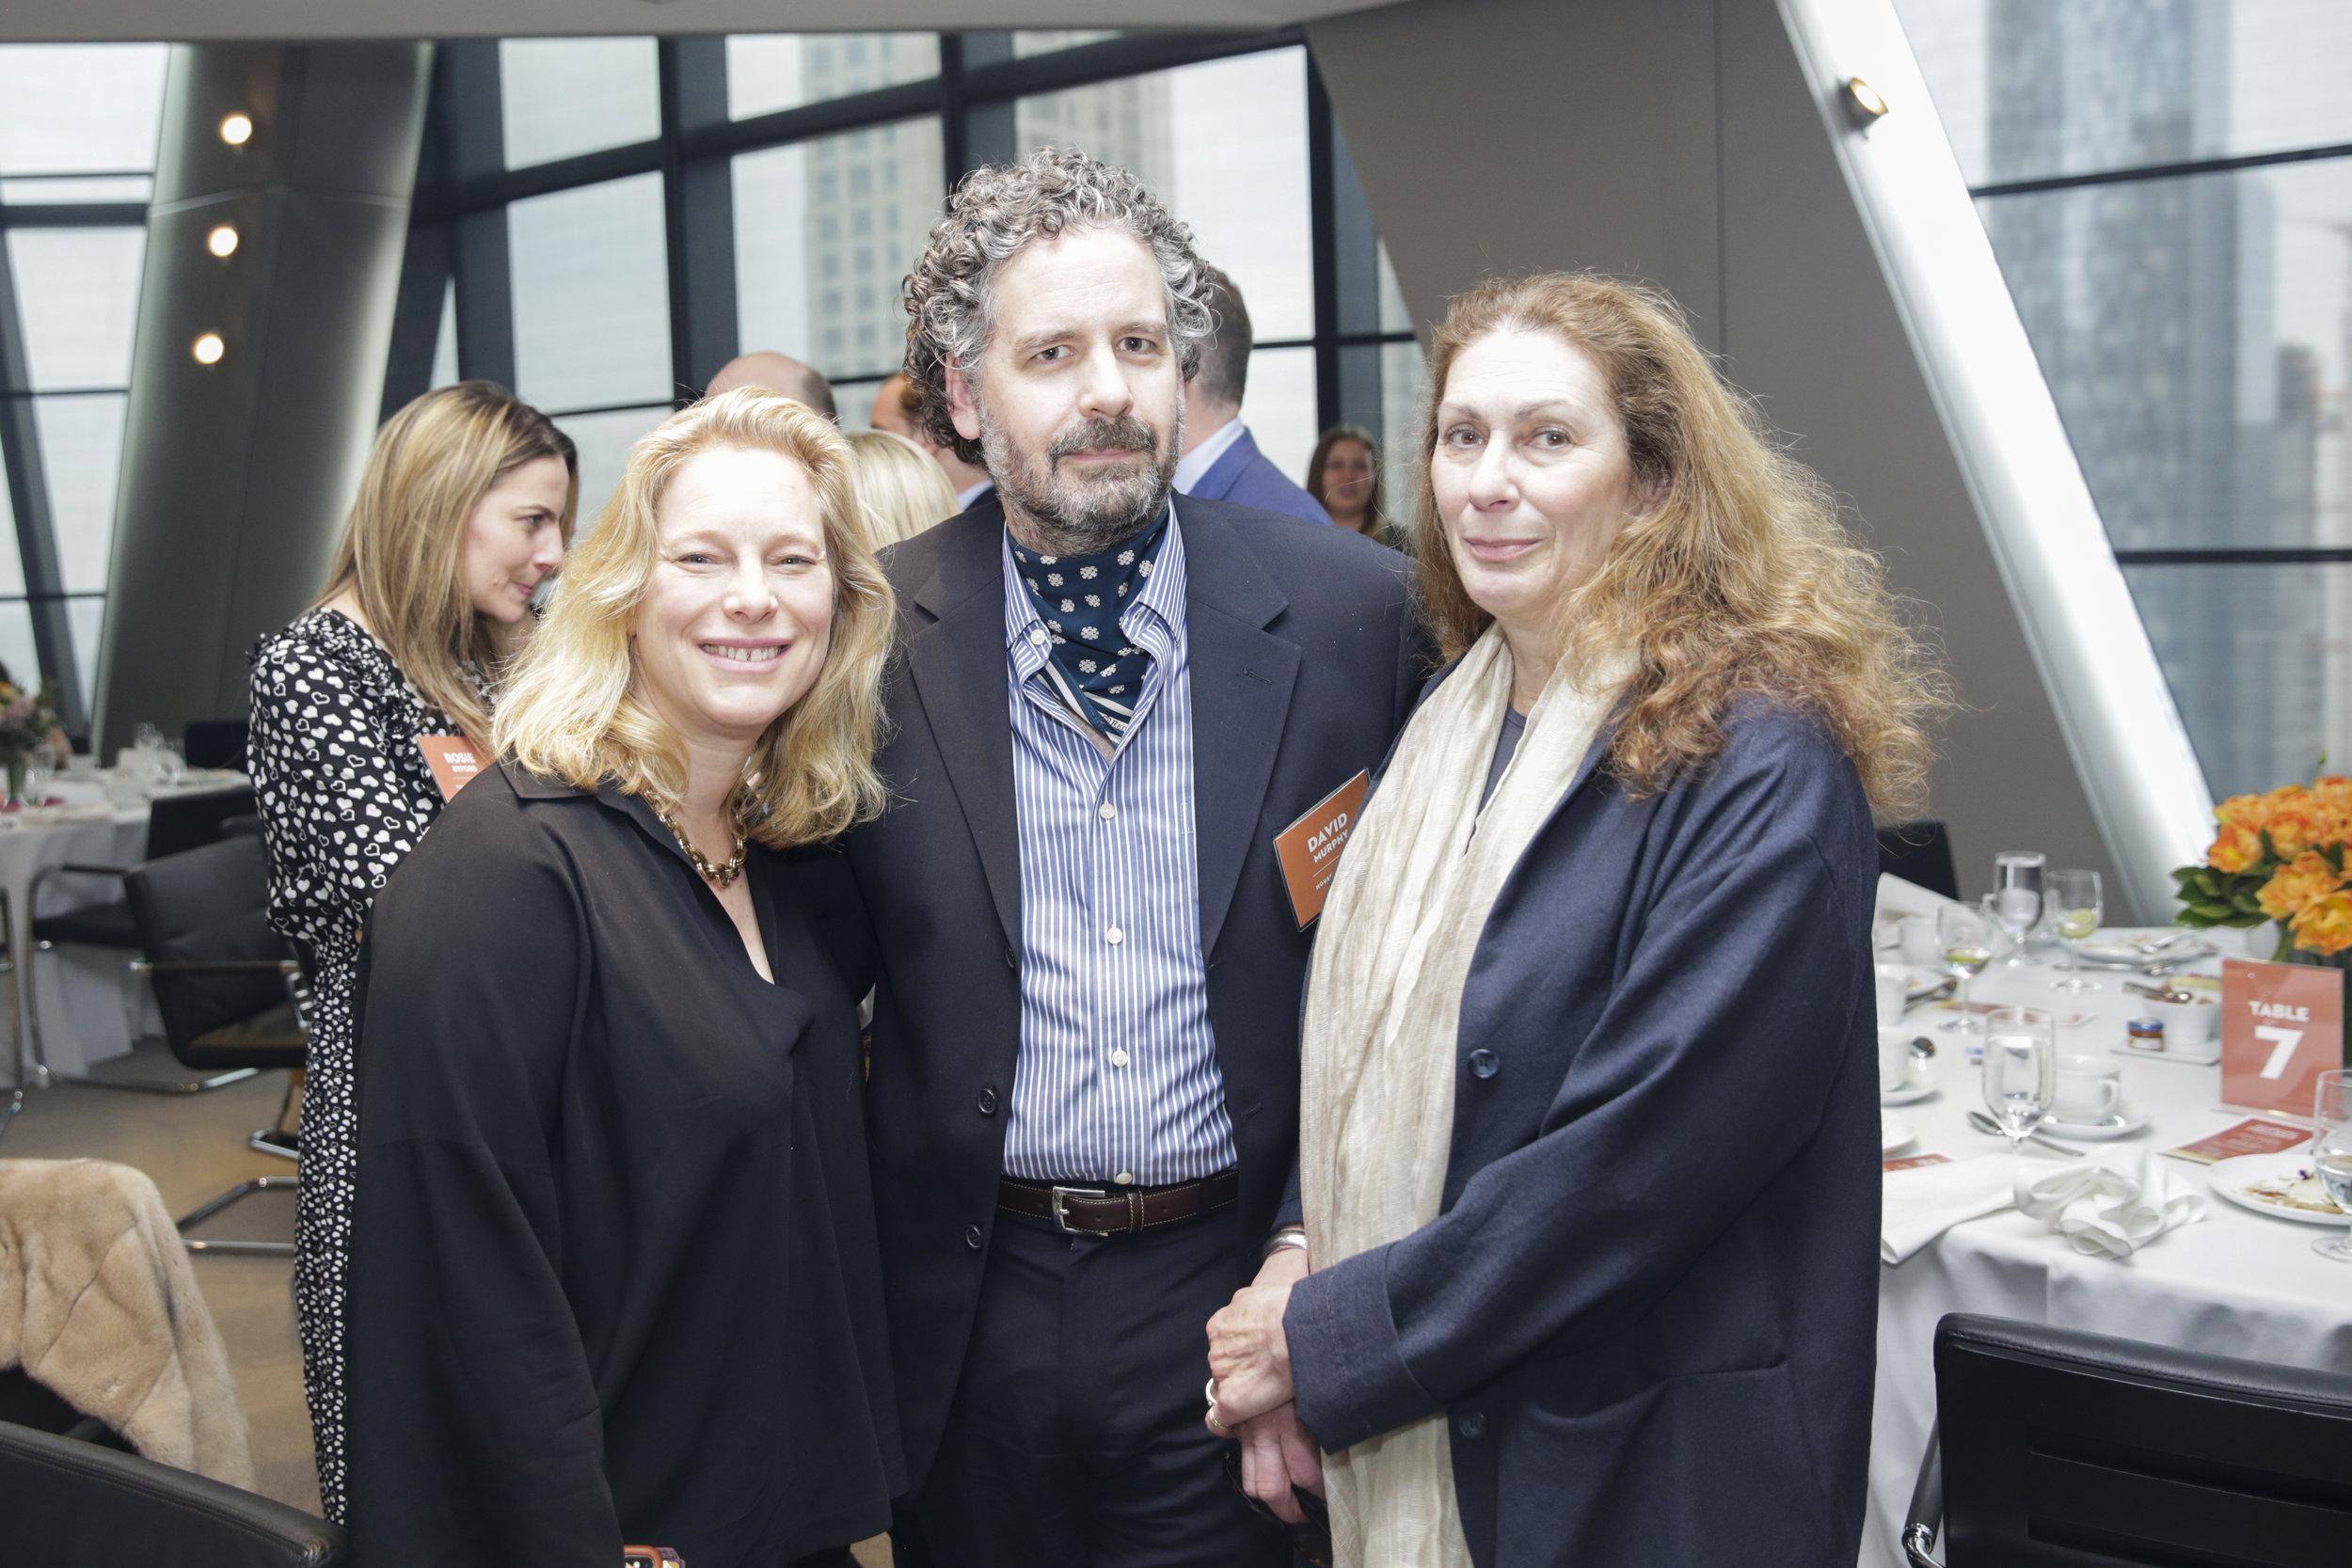 Sabine Rothman, David Murphy, and Lyn Schroeder